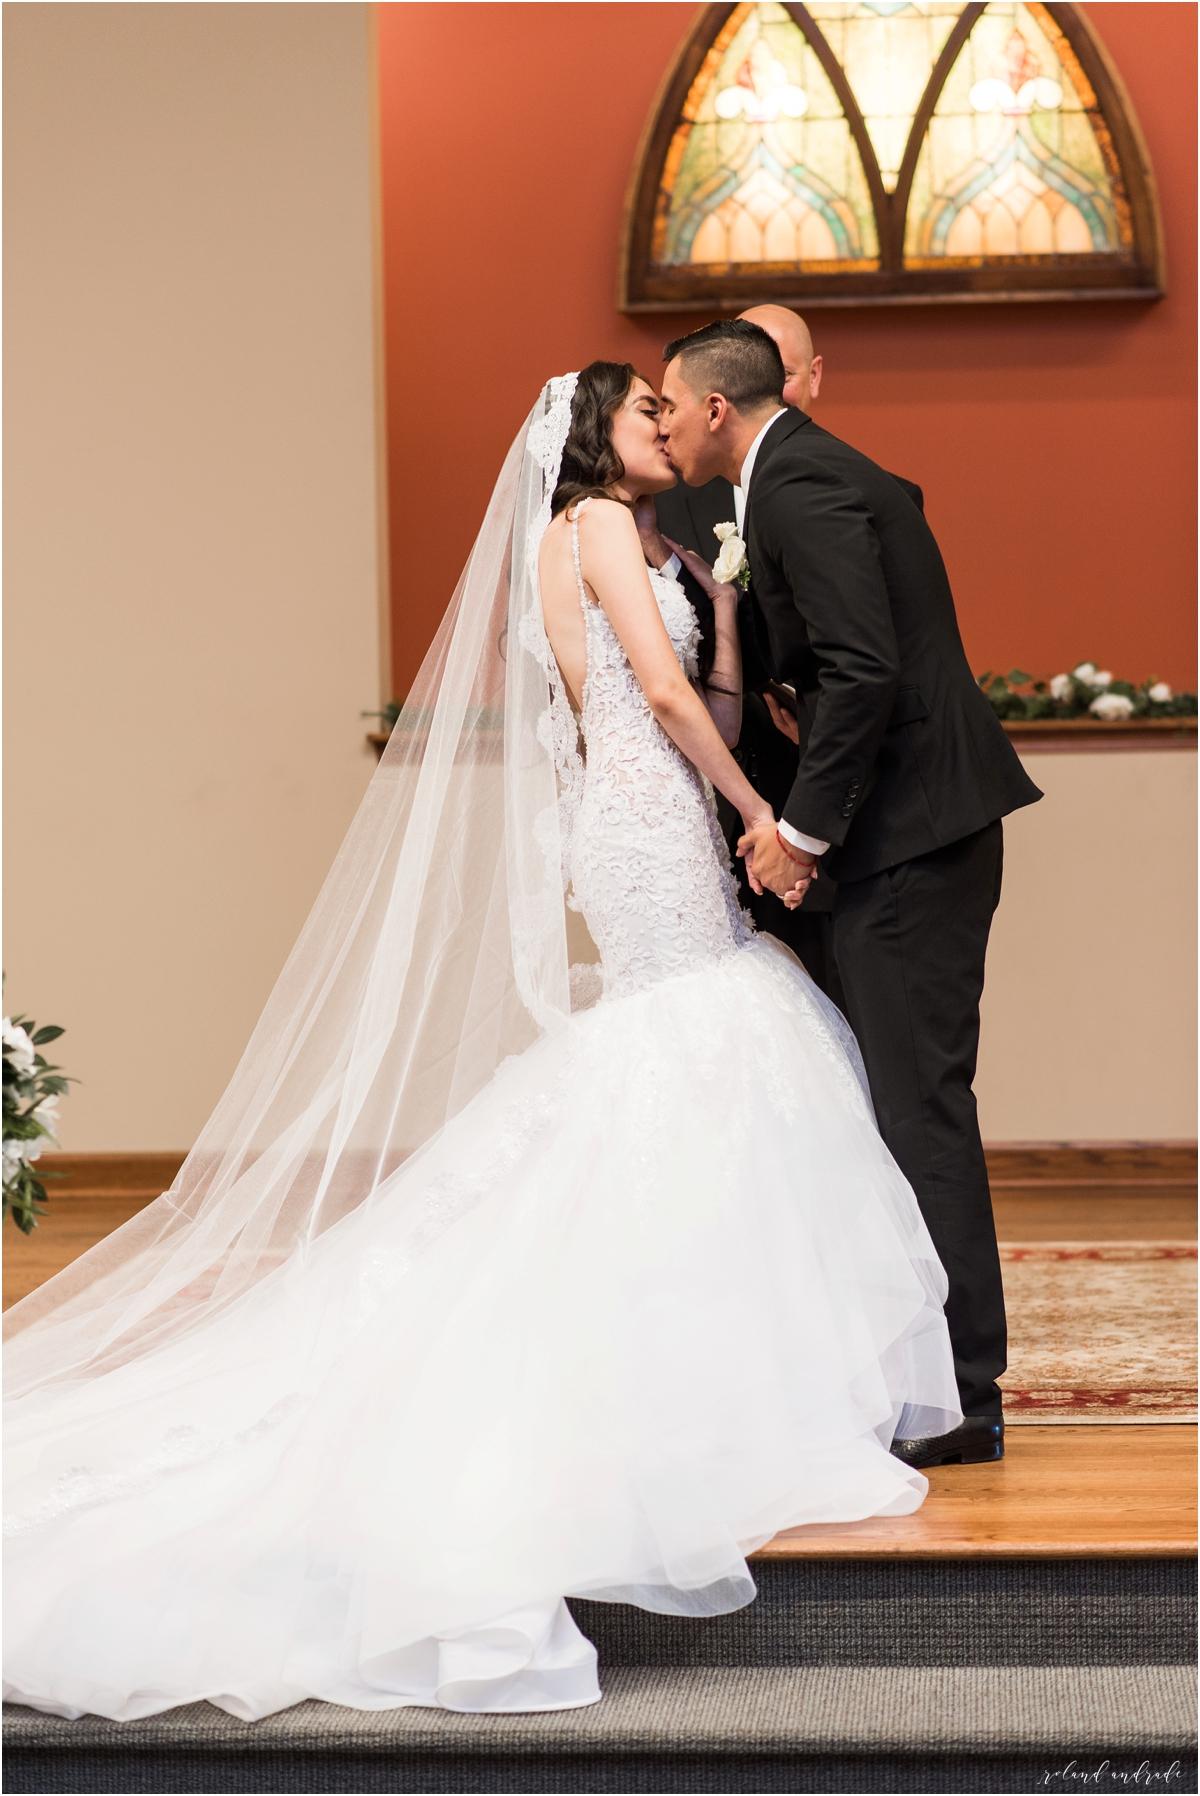 Danada House Wedding Photography Wheaton Illinois - Chicago Wedding Photography_0031.jpg